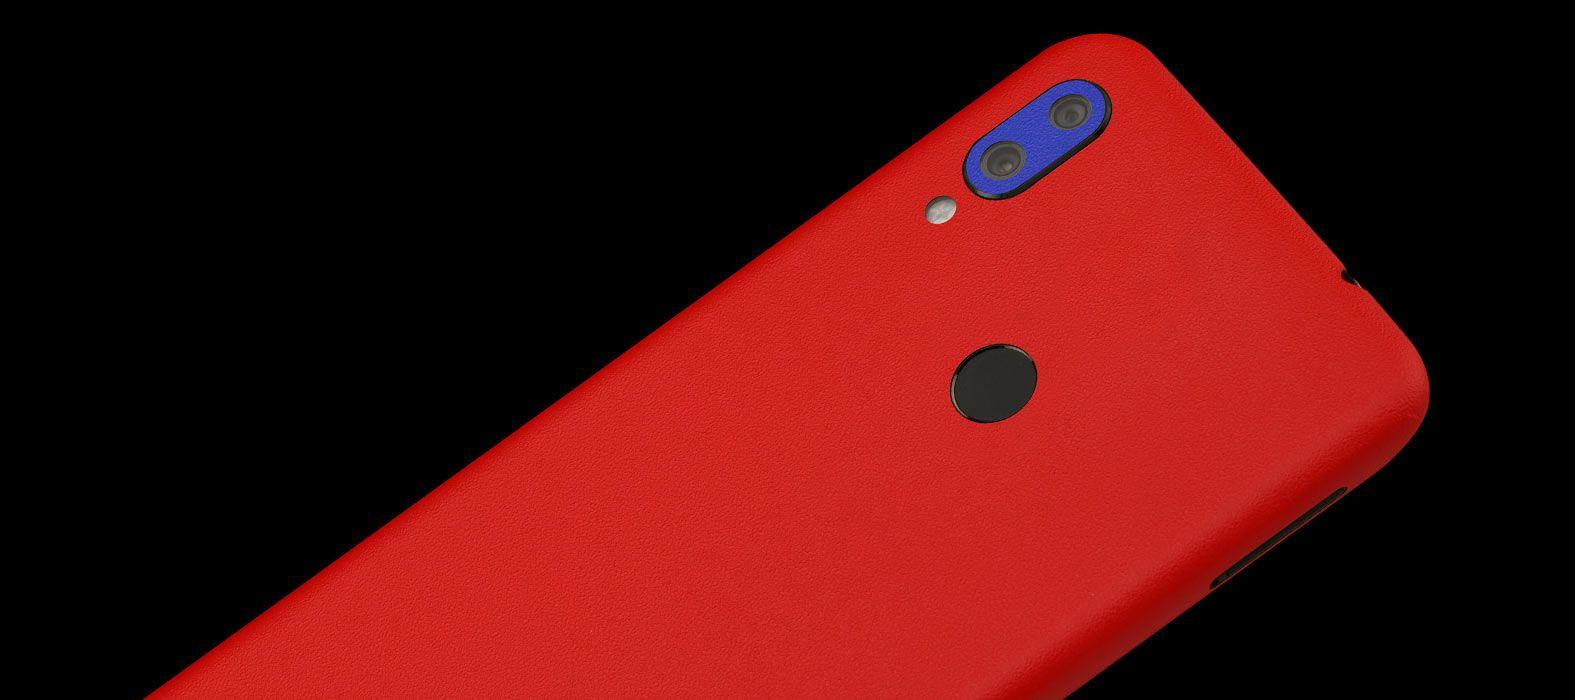 Redmi-note-7-pro_Red-Sandstone_Skins